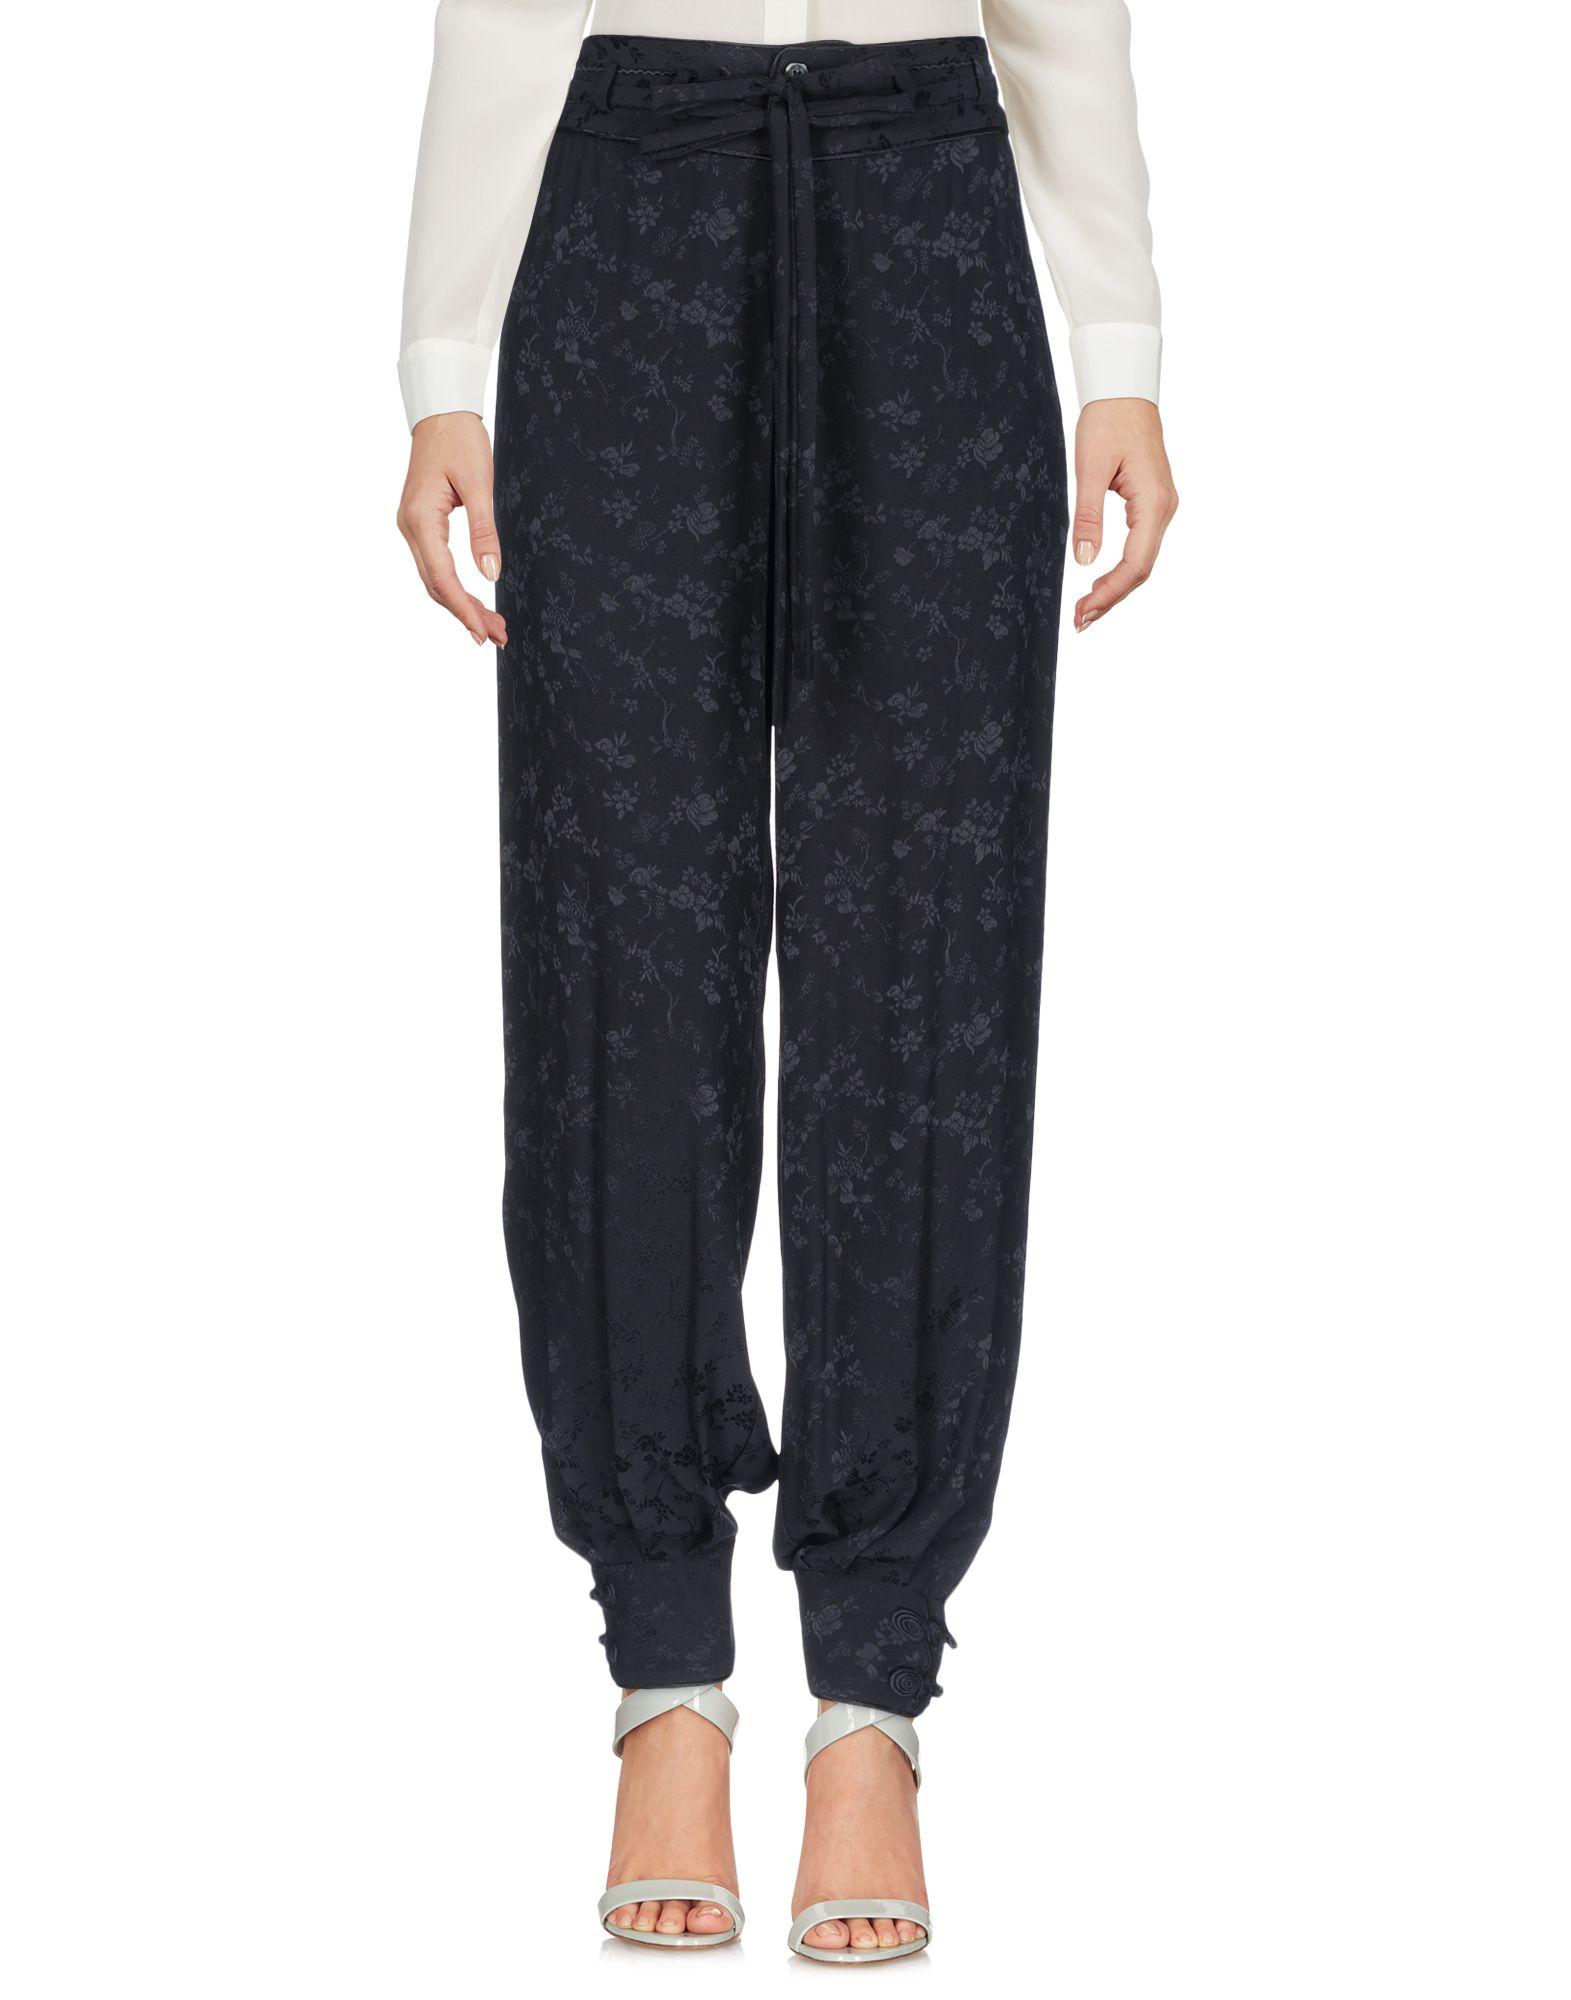 Pantalone Mayle Donna - Acquista online su s2VtBPs4Um